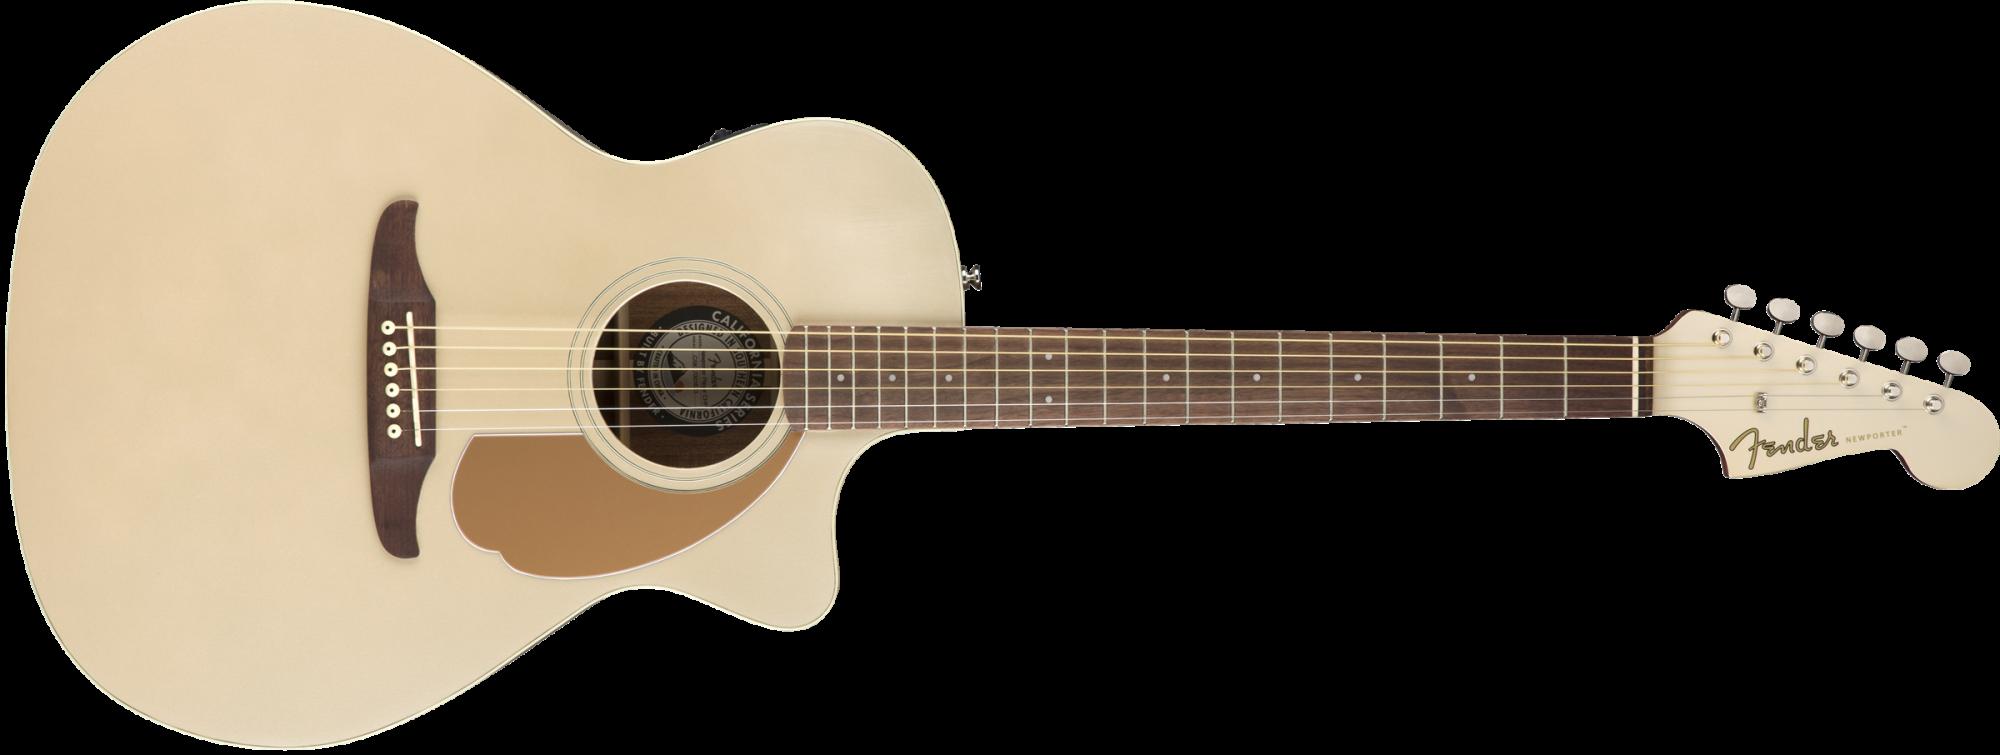 Fender Newporter Player, Walnut Fingerboard